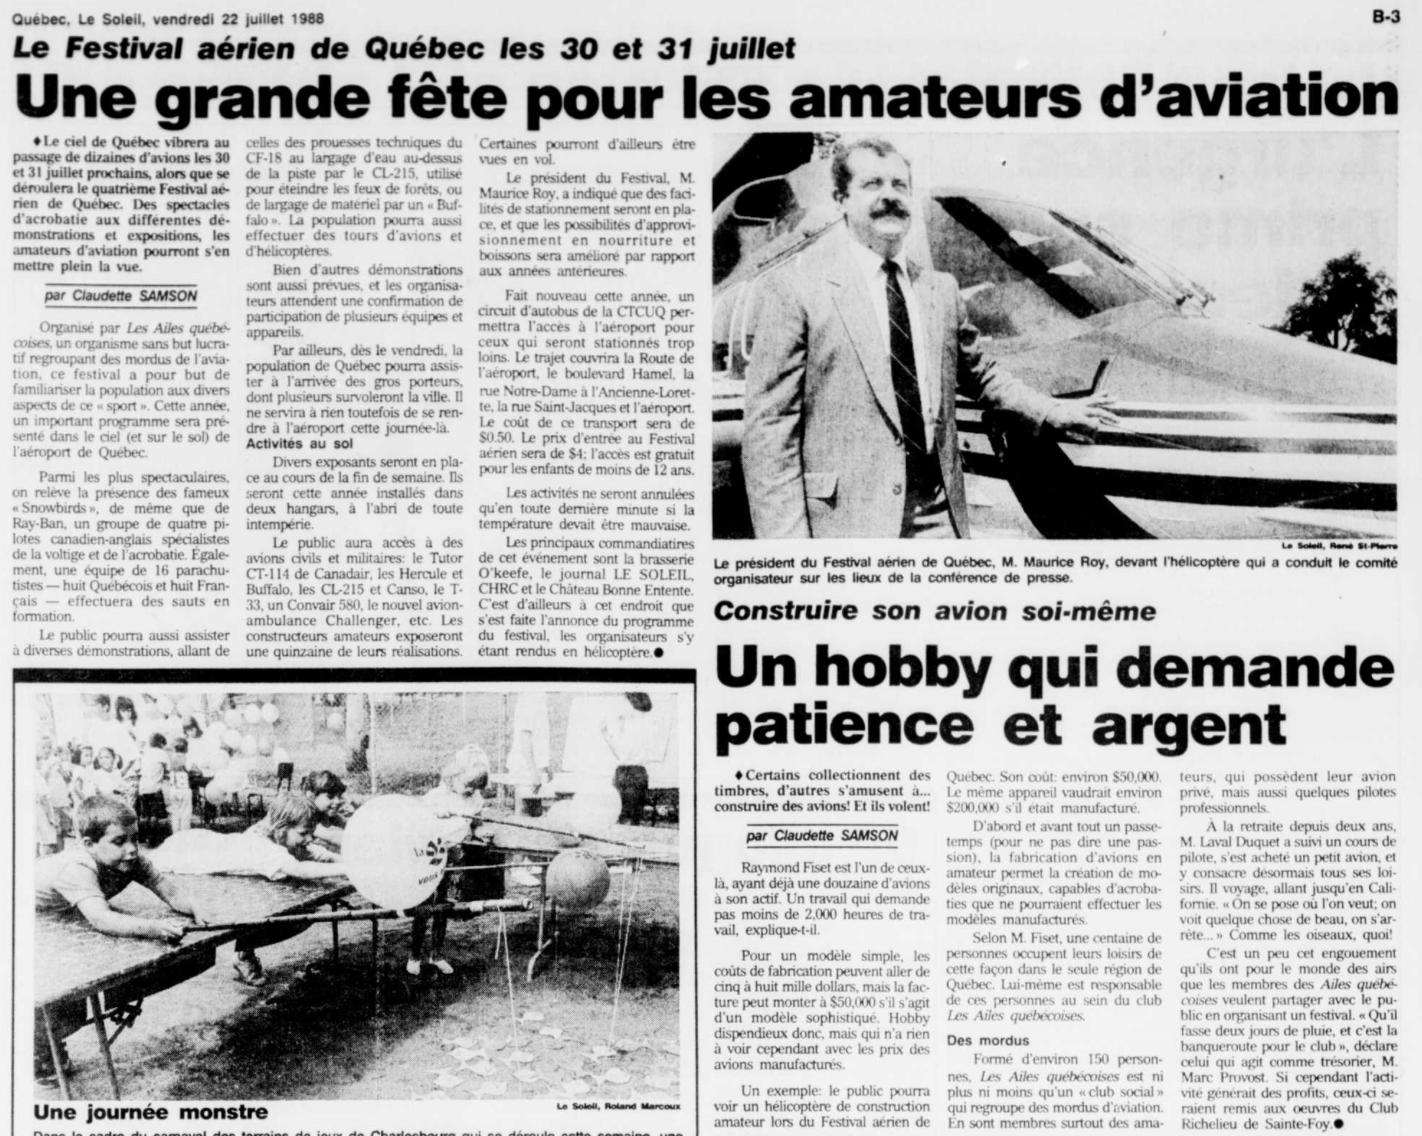 Journal Le Soleil 22 juillet 1988